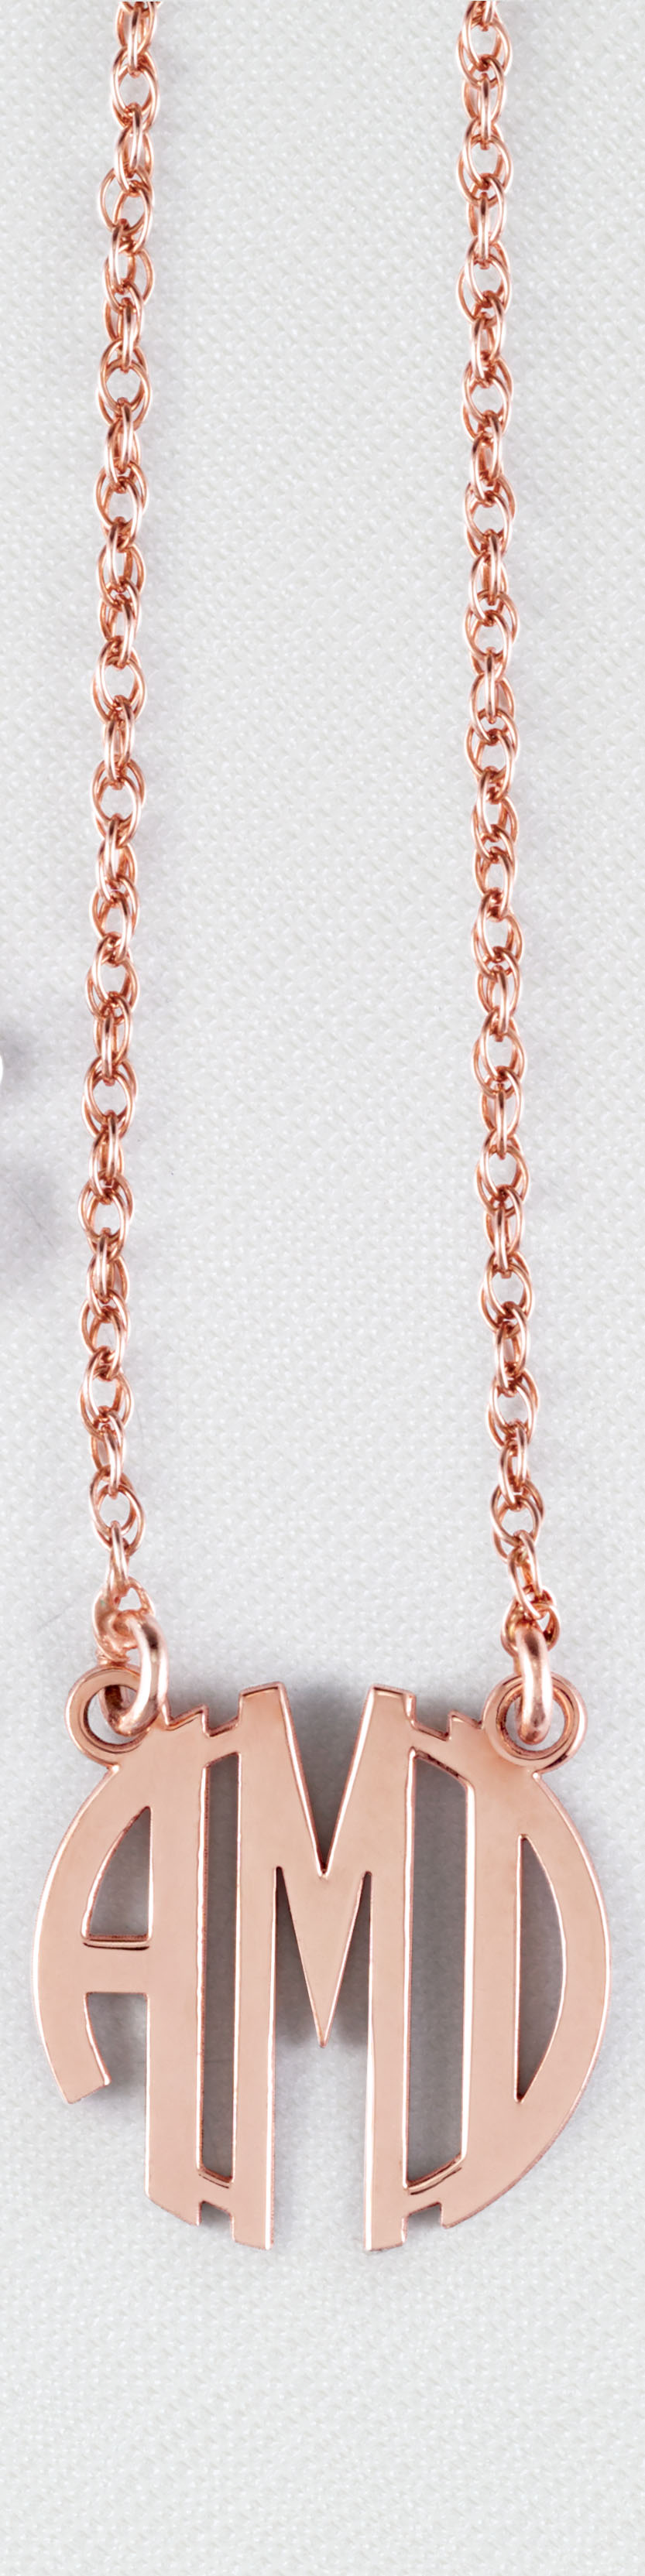 31++ Dons jewelry clinton iowa viral